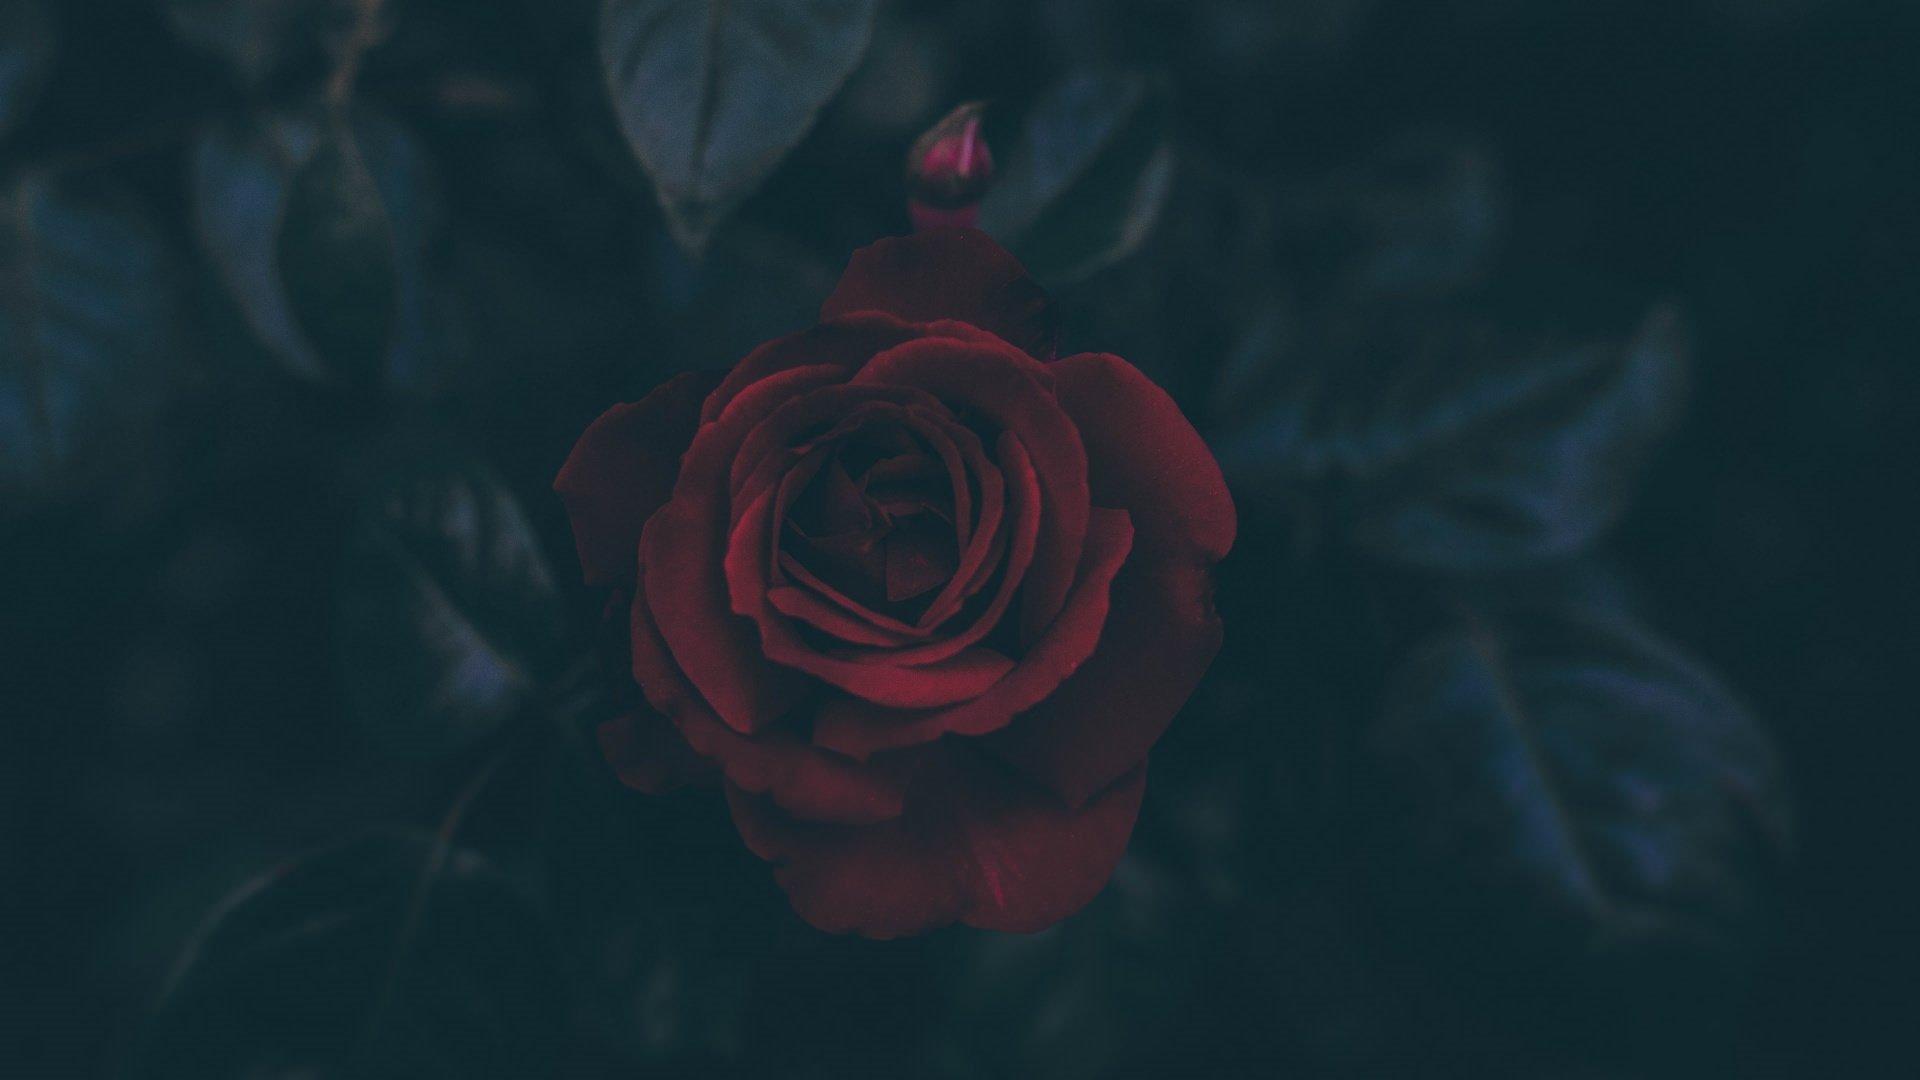 Aesthetic Rose Wallpaper Free